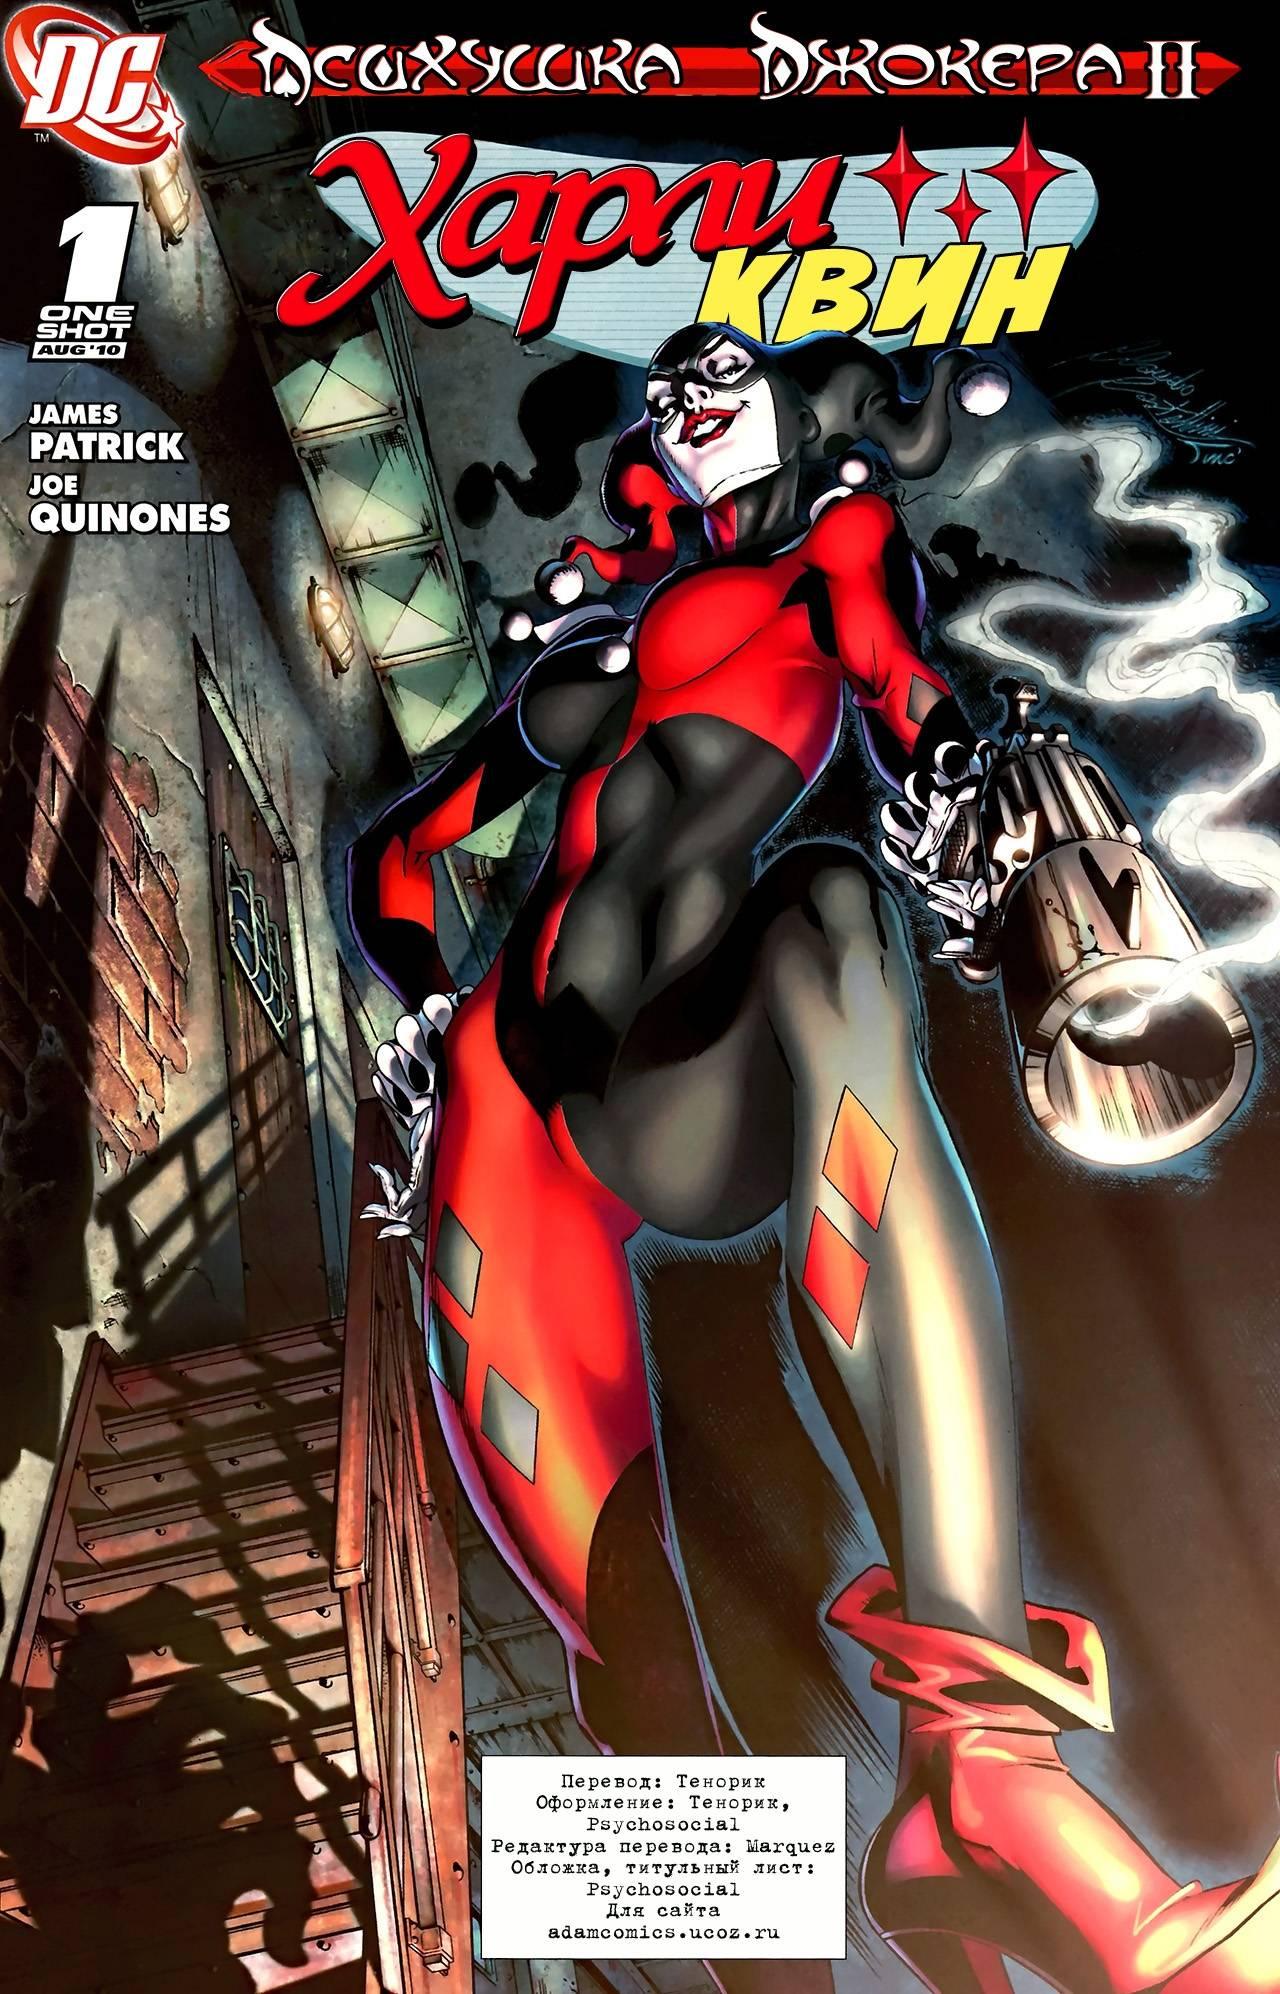 Психушка Джокера 2: Харли Квинн онлайн